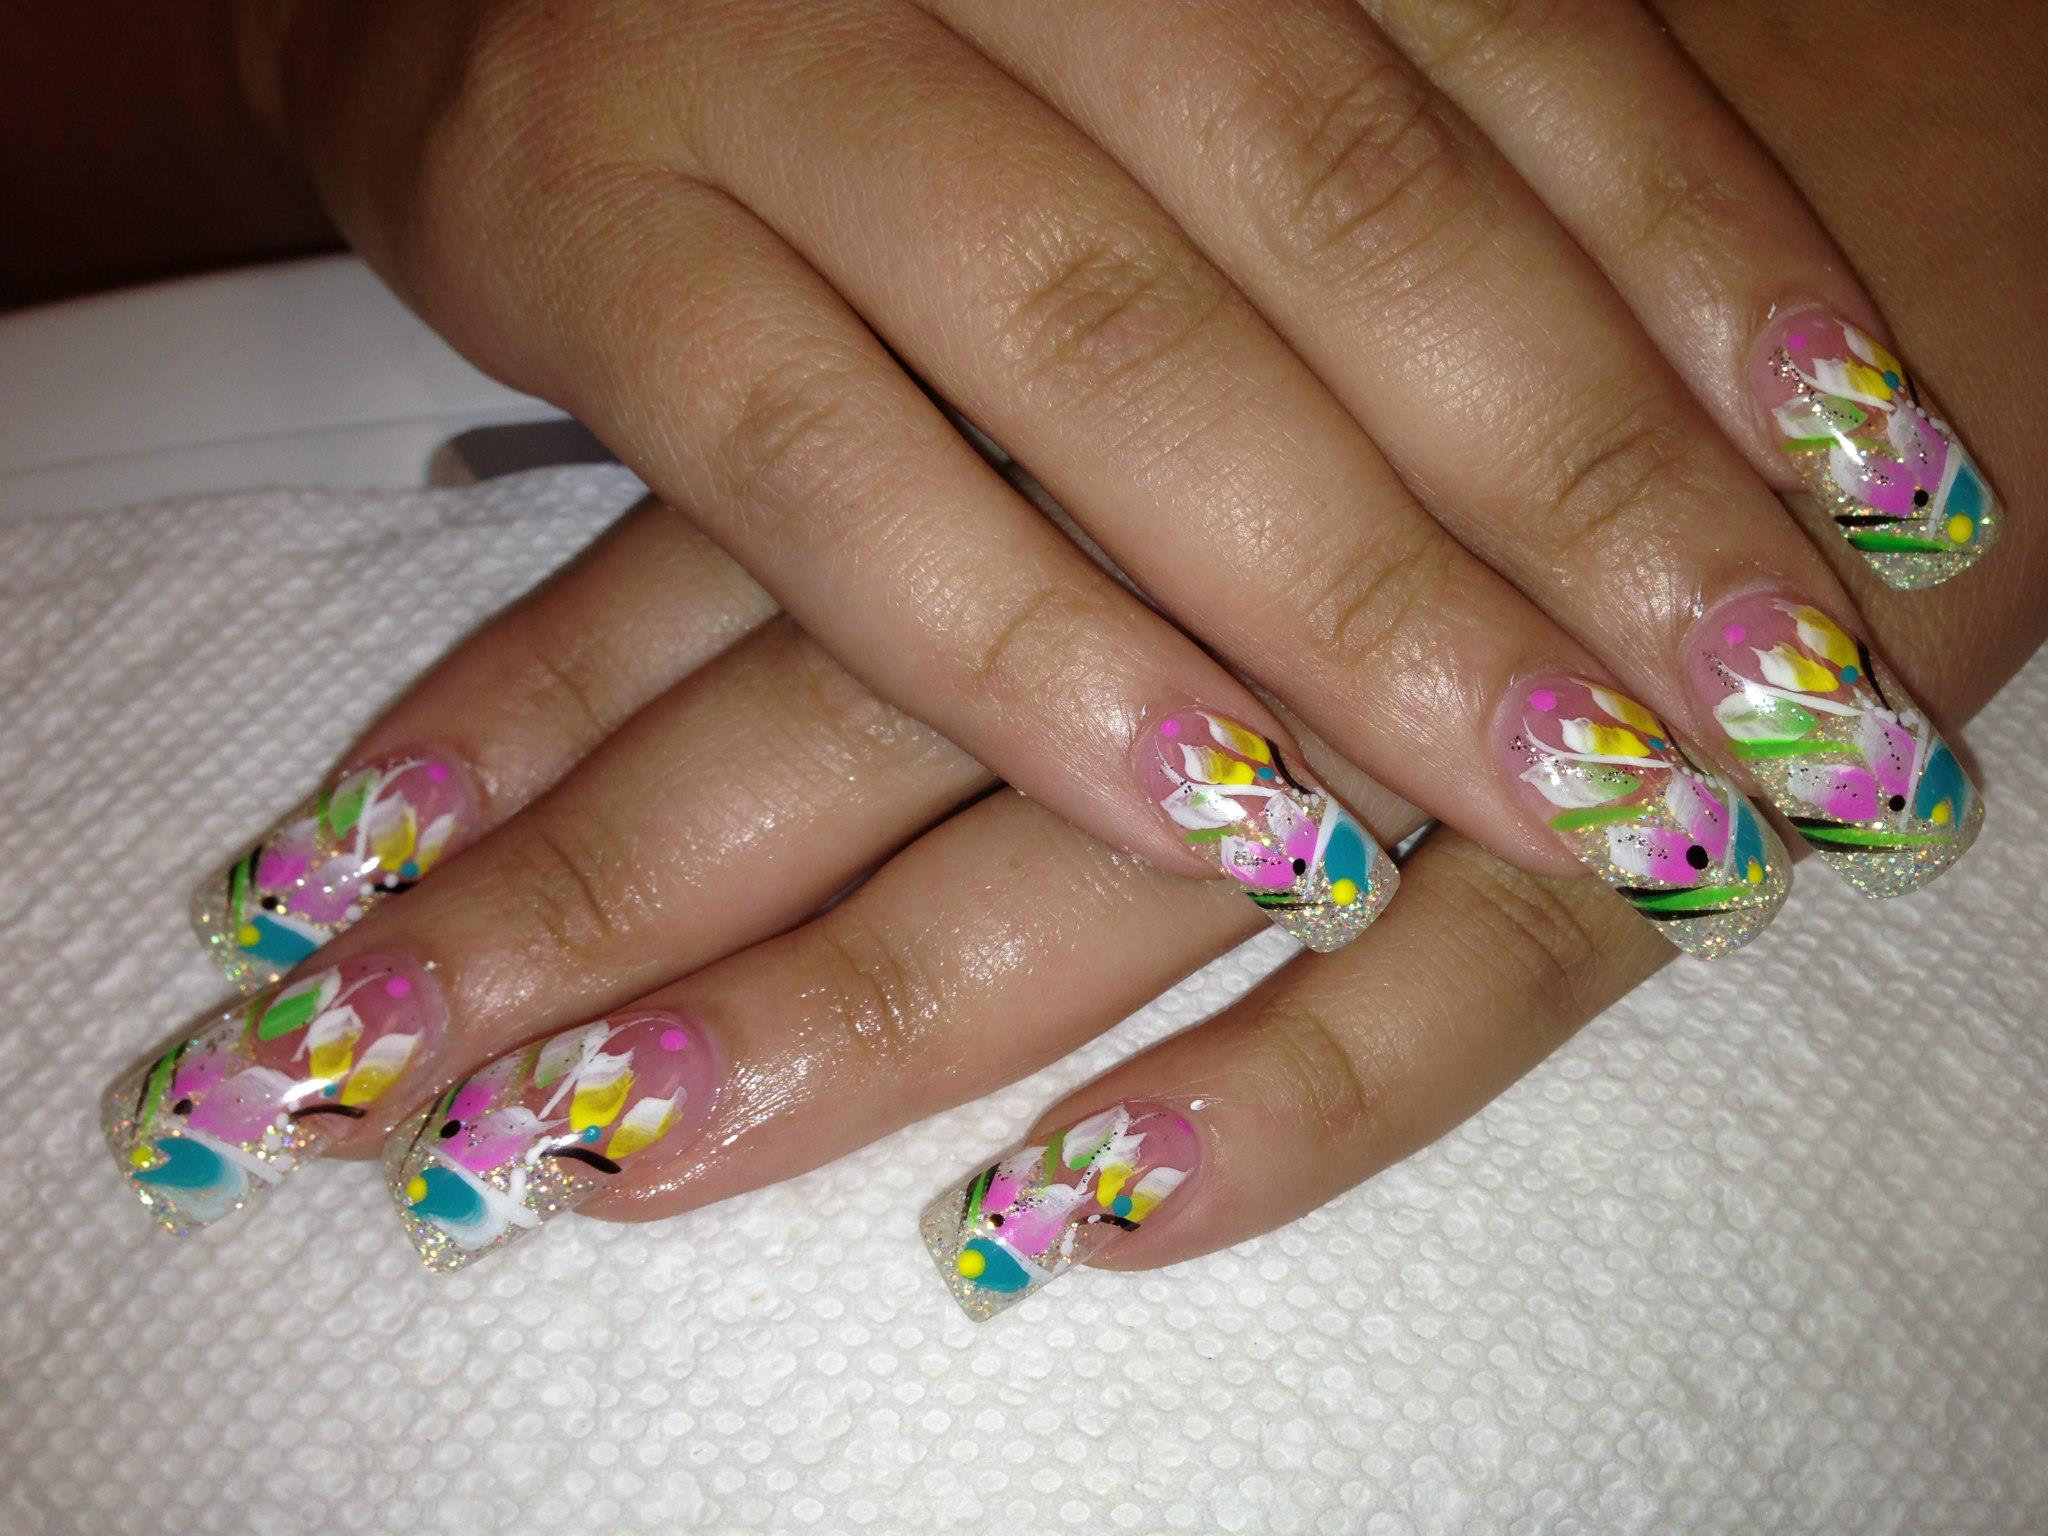 Diamond Lilies, nail art designs by Top Nails, Clarksville TN. | Top ...